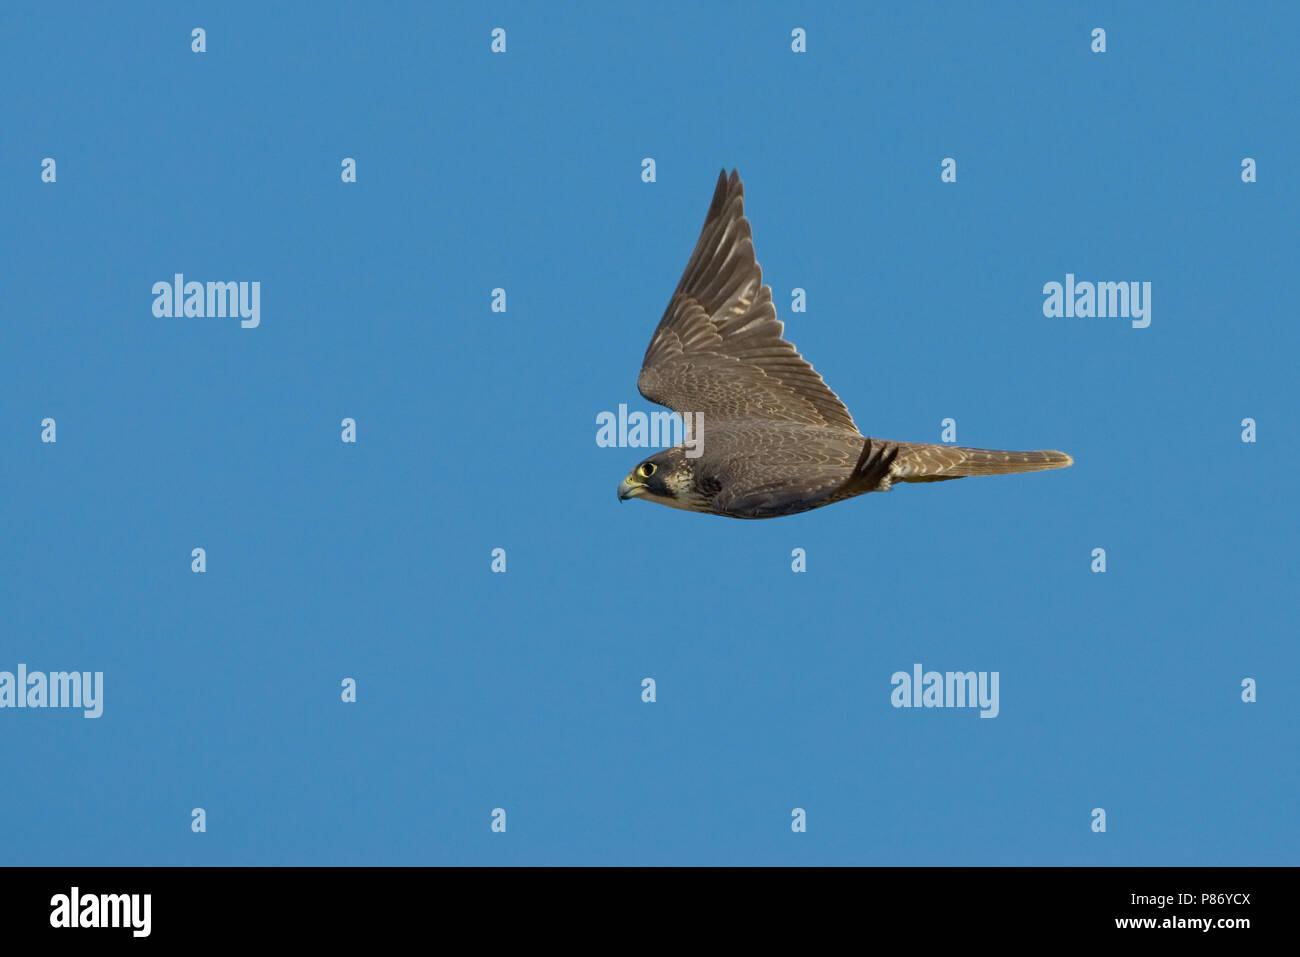 Pellegrino; Peregrin; Falco peregrinus - Stock Image